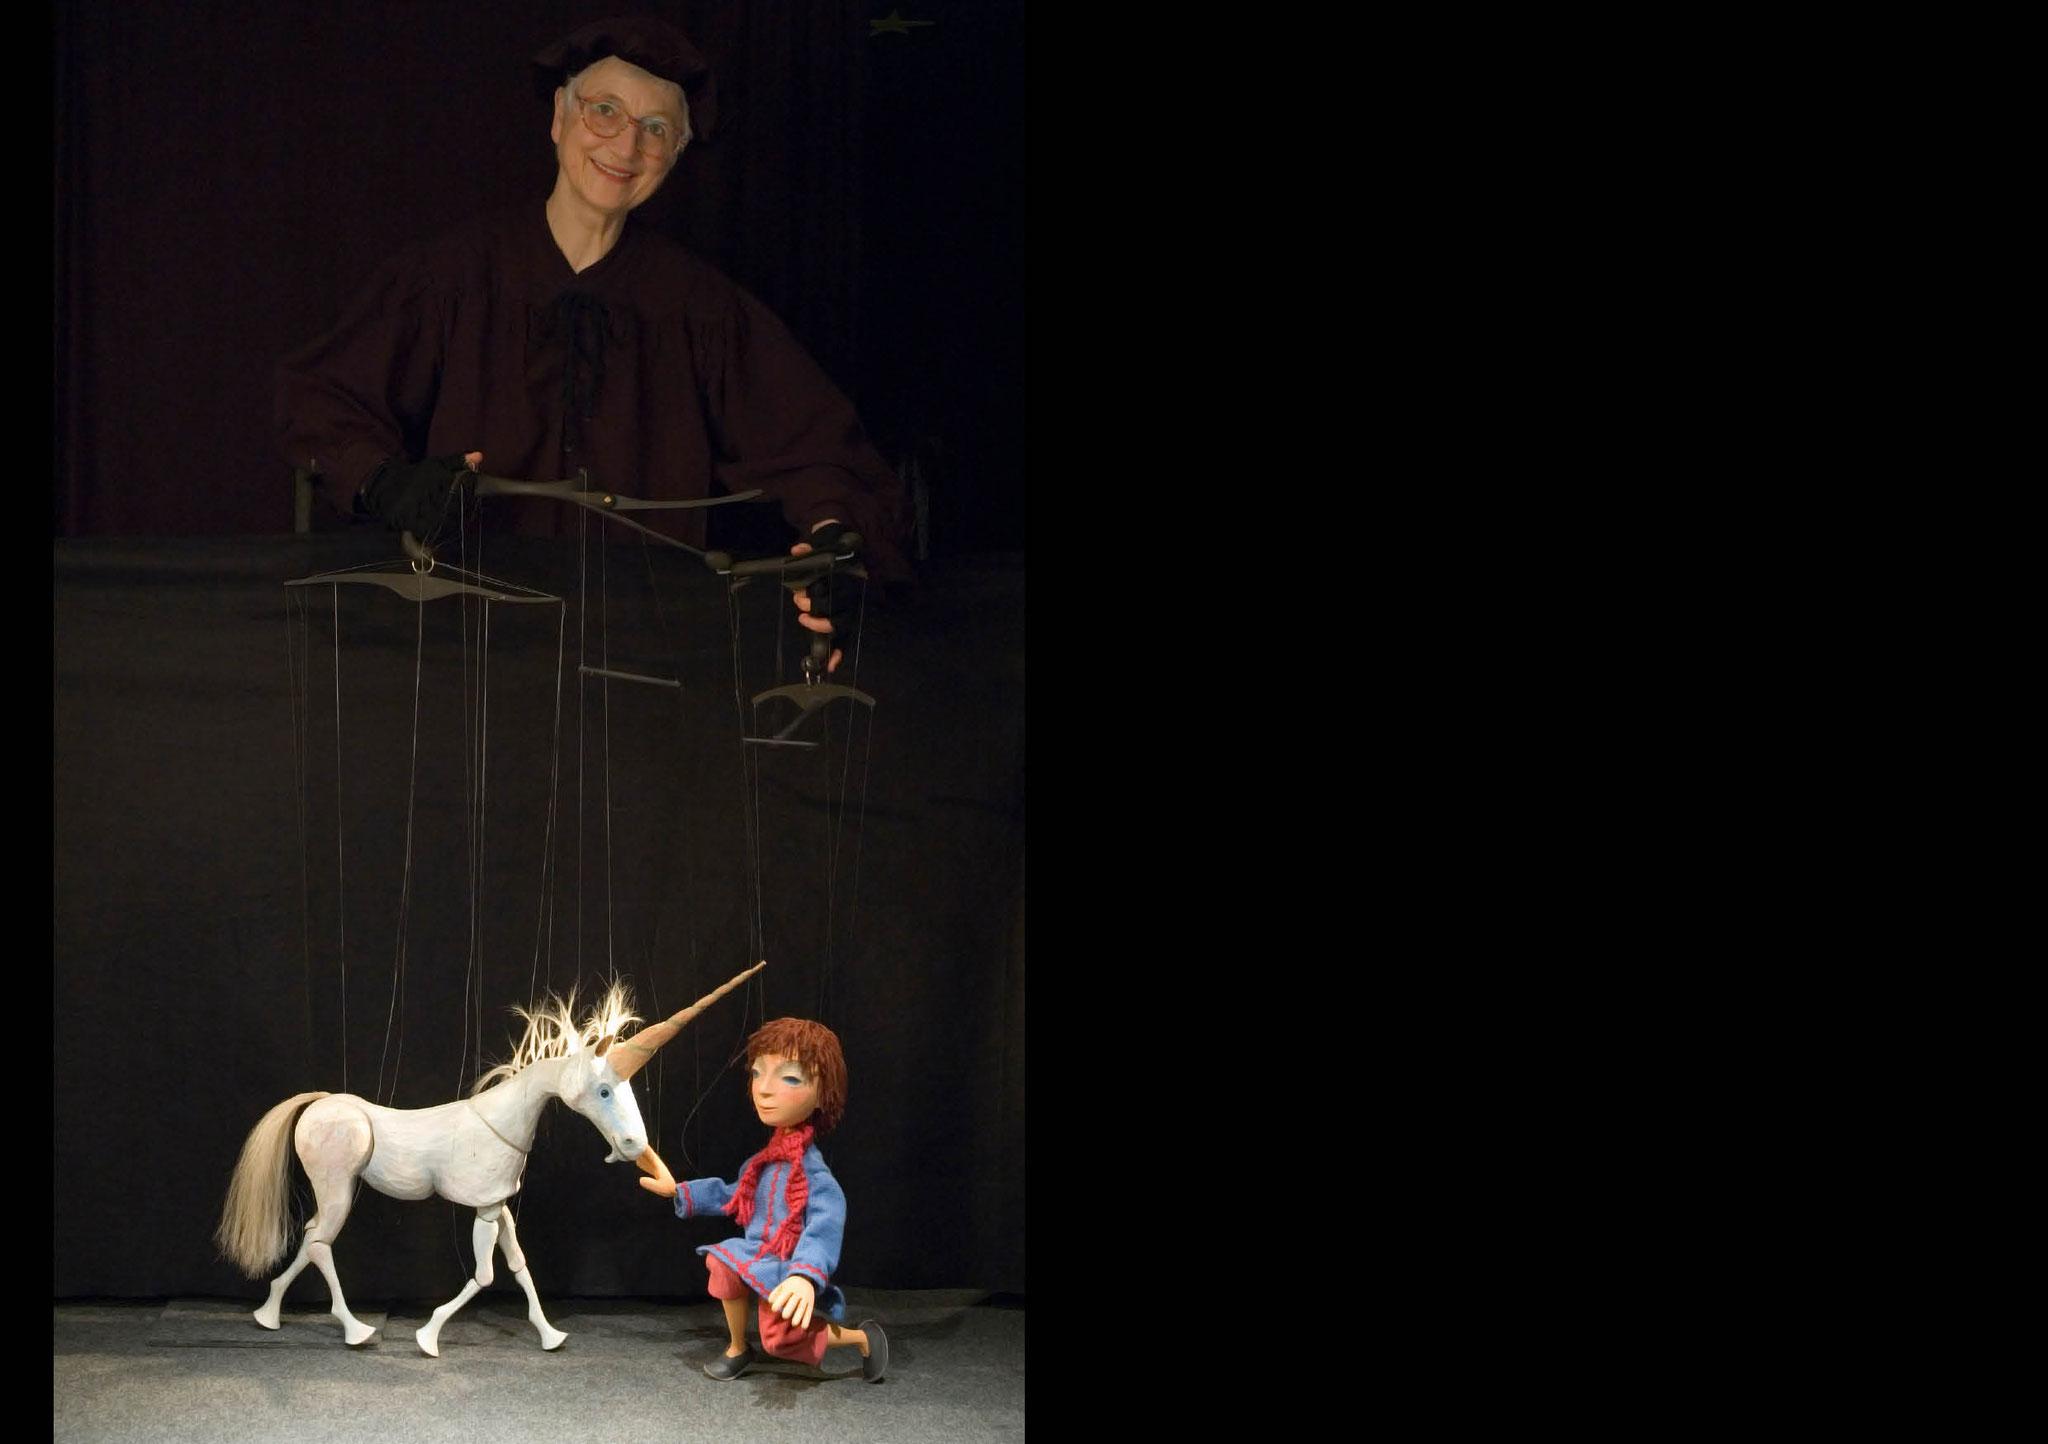 Marionettentheater Zaubervogel: Edith Nikel